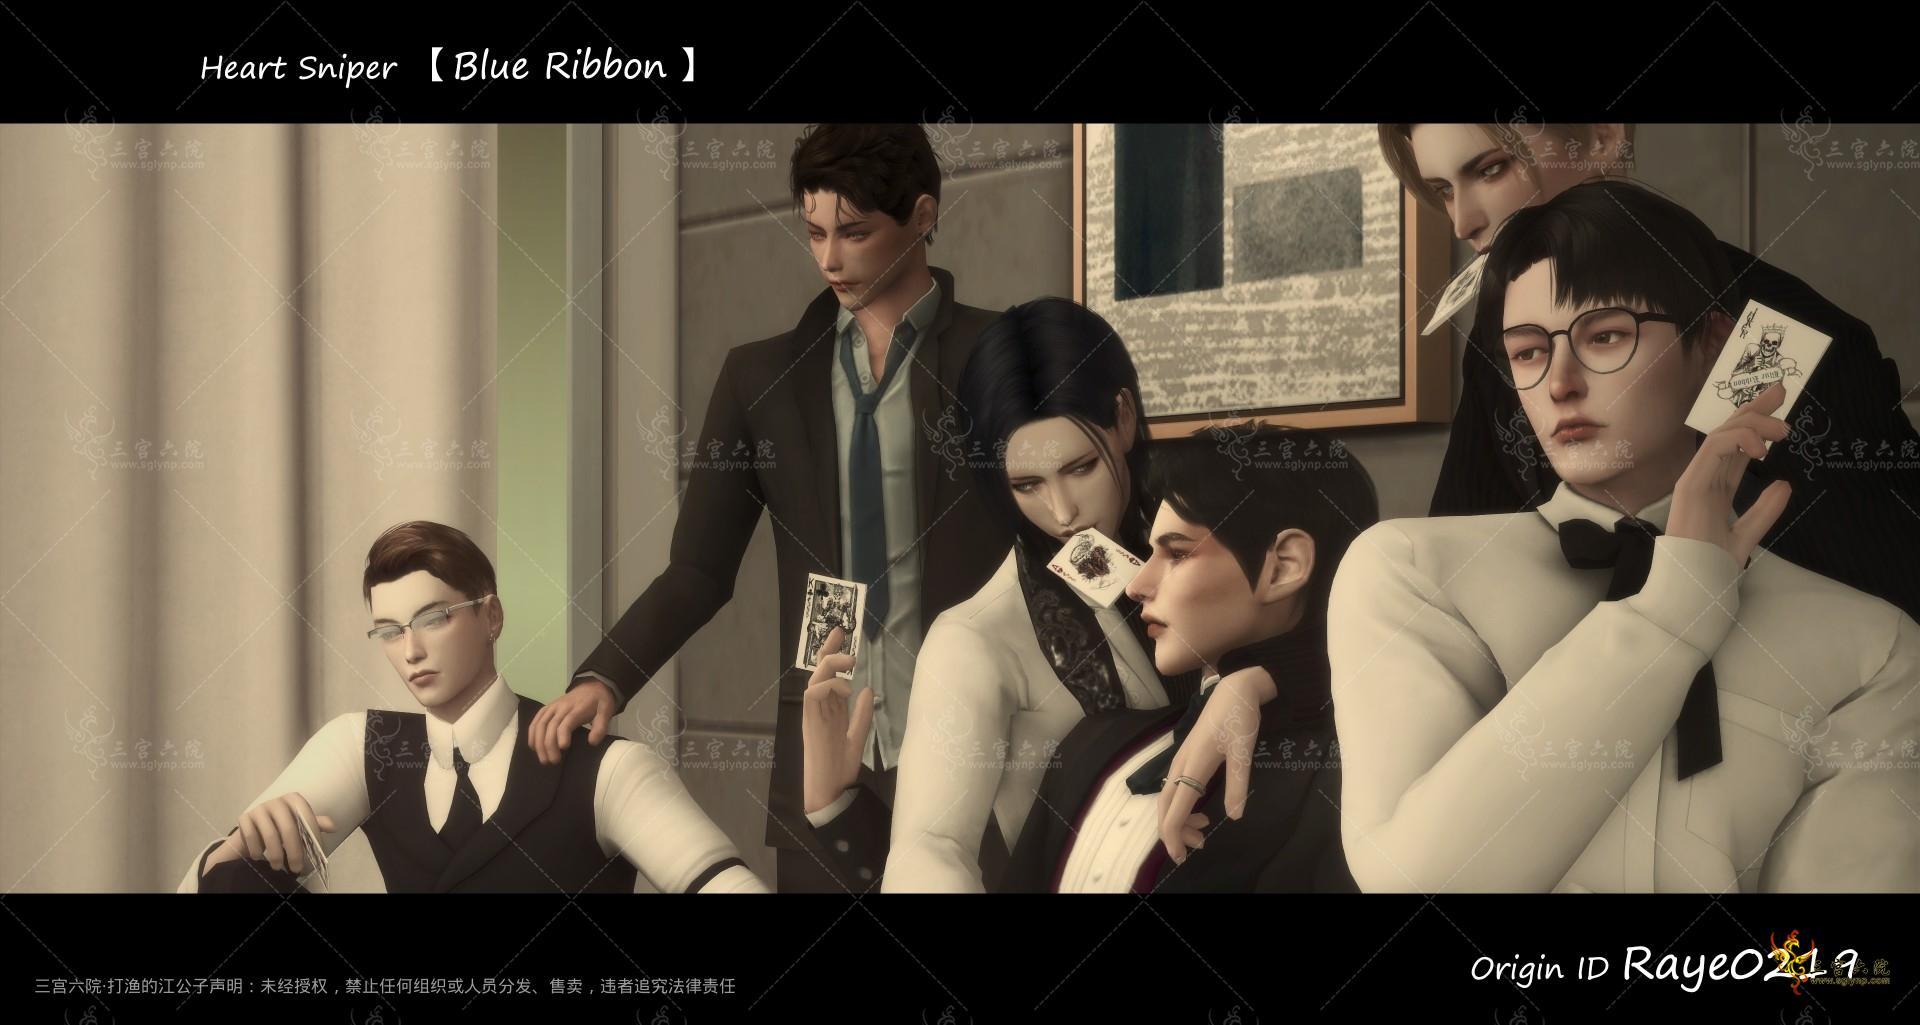 HS III [BLUE RIBBON] 04.png